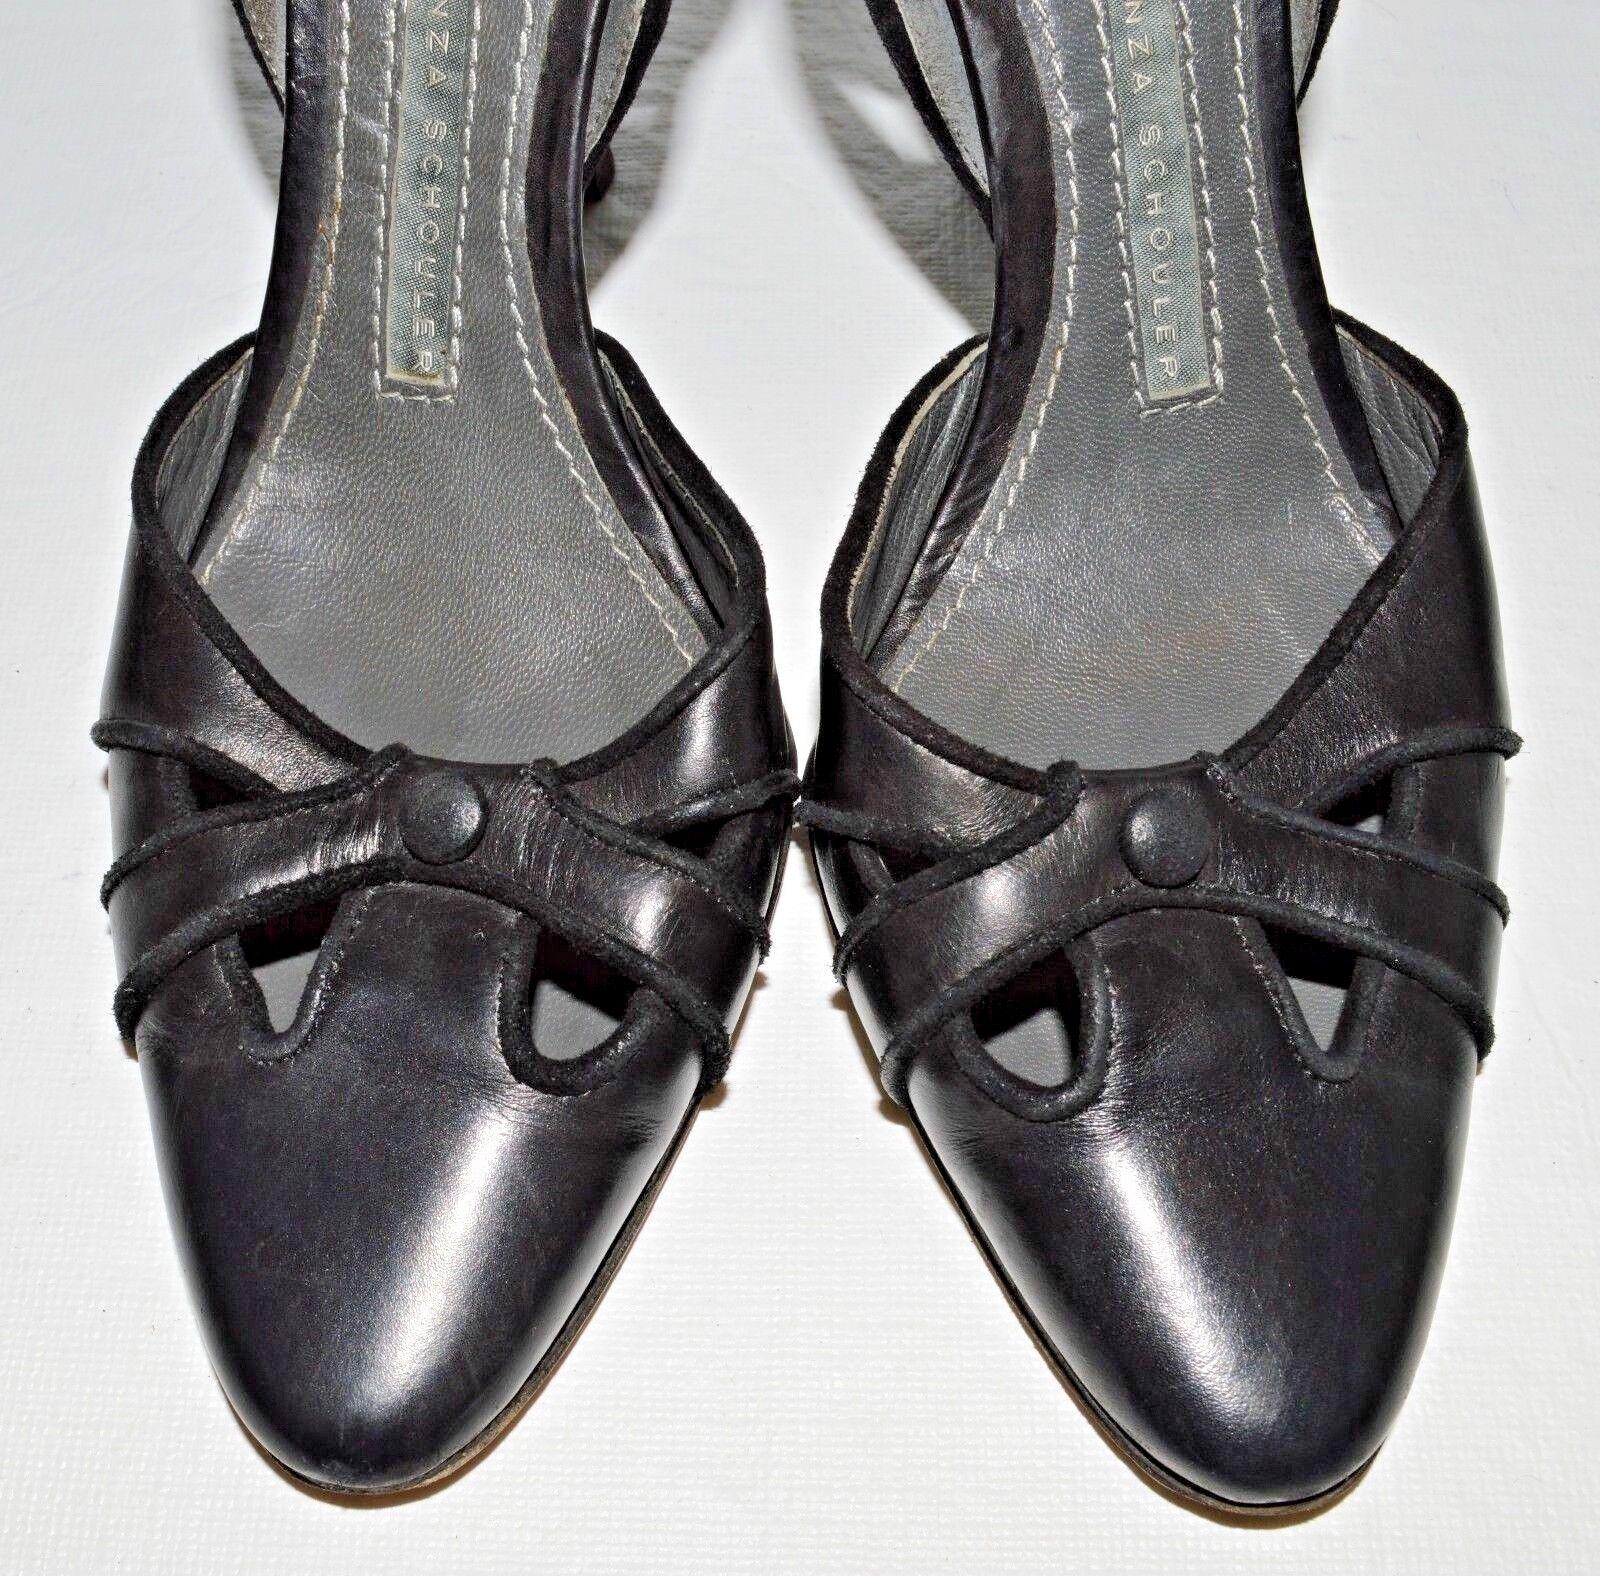 PROENZA SCHOULER SZ D'ORSAY 6 M 36 BLACK LEATHER D'ORSAY SZ PUMPS HEELS DRESS Schuhe ITALY b9824f